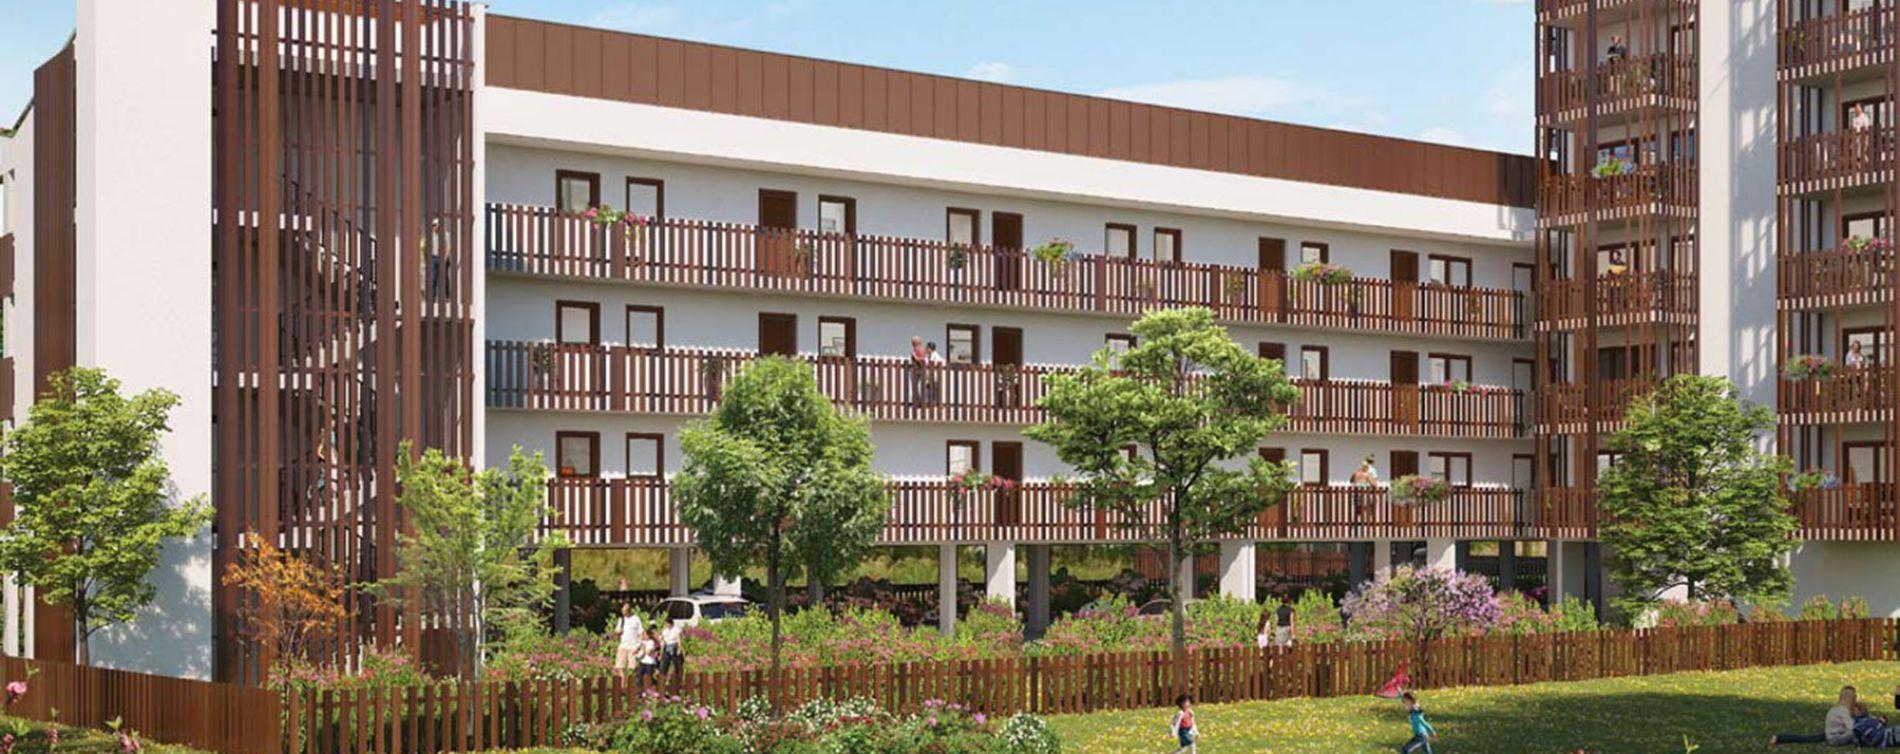 Résidence Villa Elina à Lormont